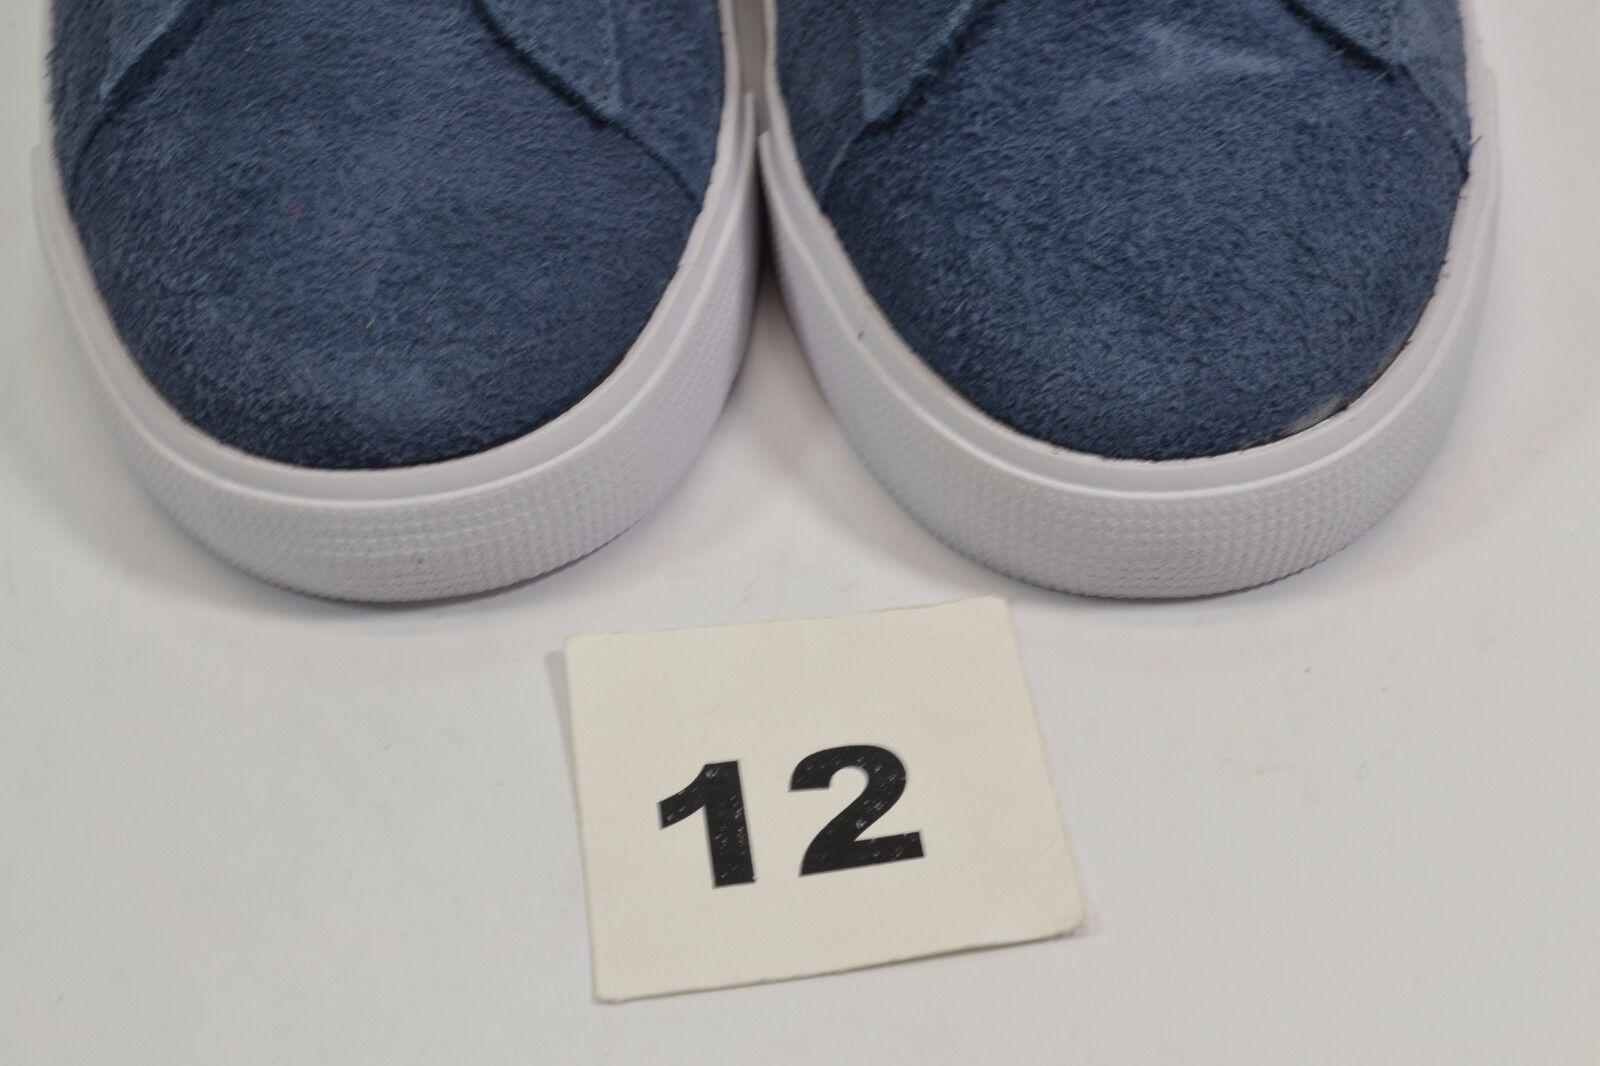 Nike blazer niedrigen gt - - - staffel blau mtllc silber lt - (d) (575) männer, schuhe f8653b